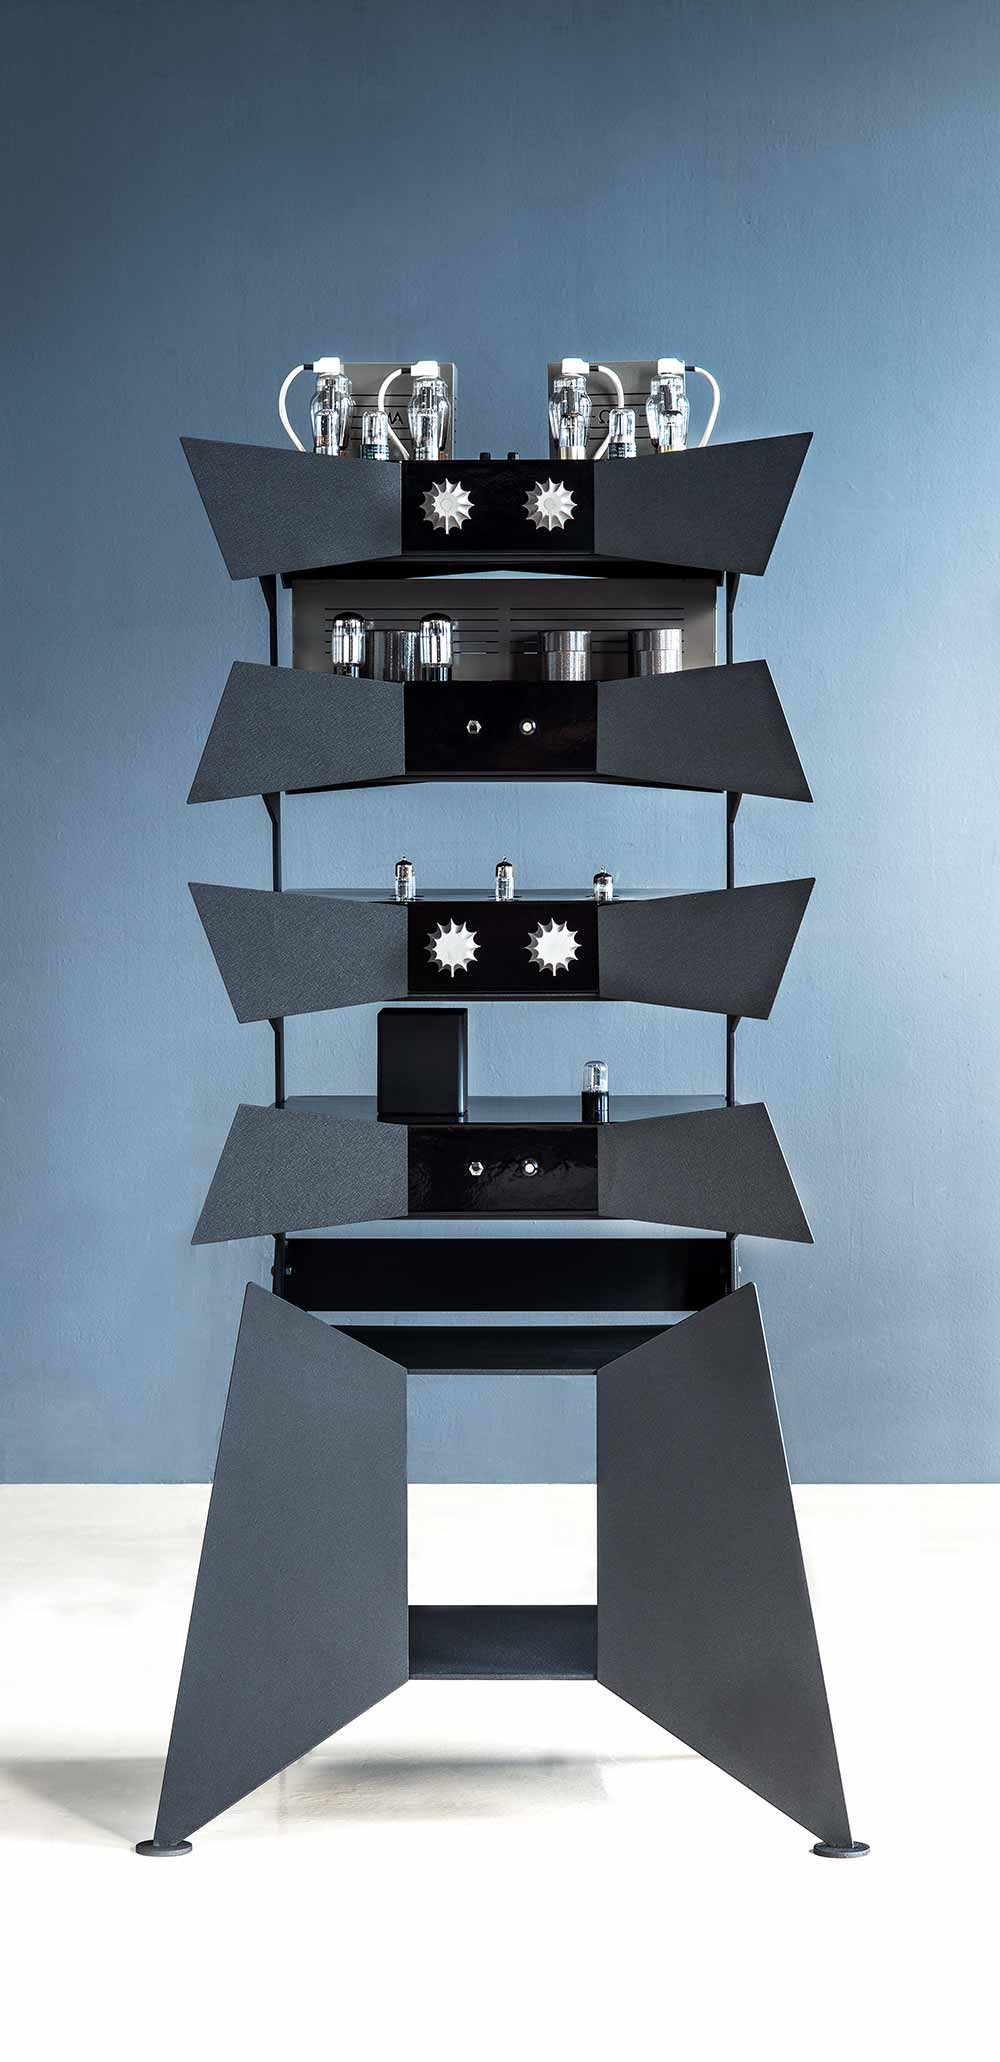 wizard high end audio blog oswalds mill audio metamorphosis amplifier rack system. Black Bedroom Furniture Sets. Home Design Ideas